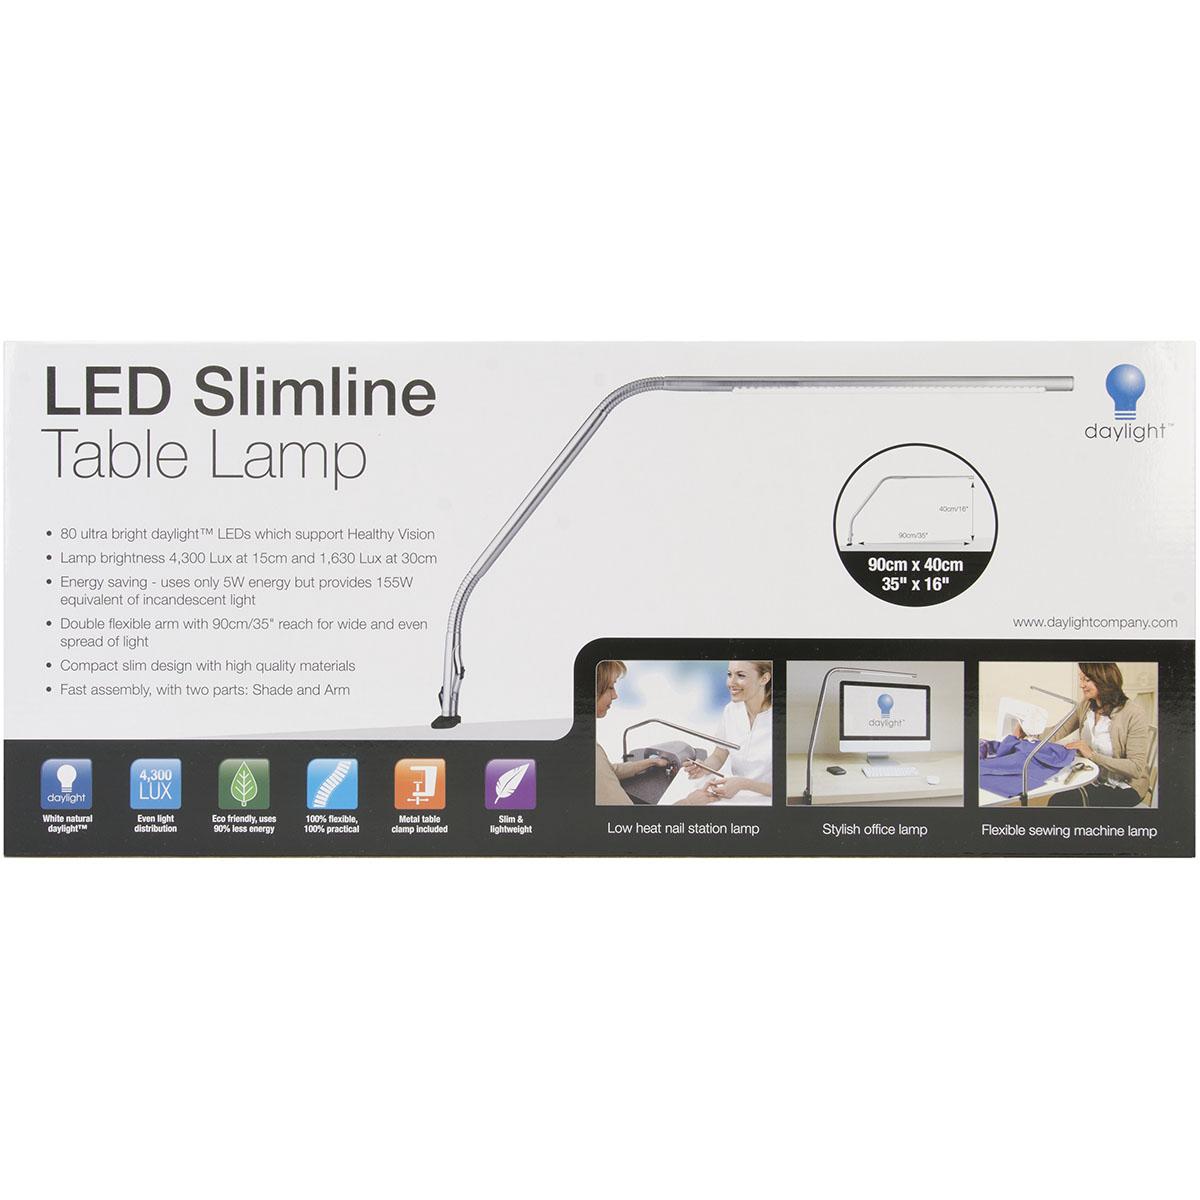 LED Slimline Table Lamp